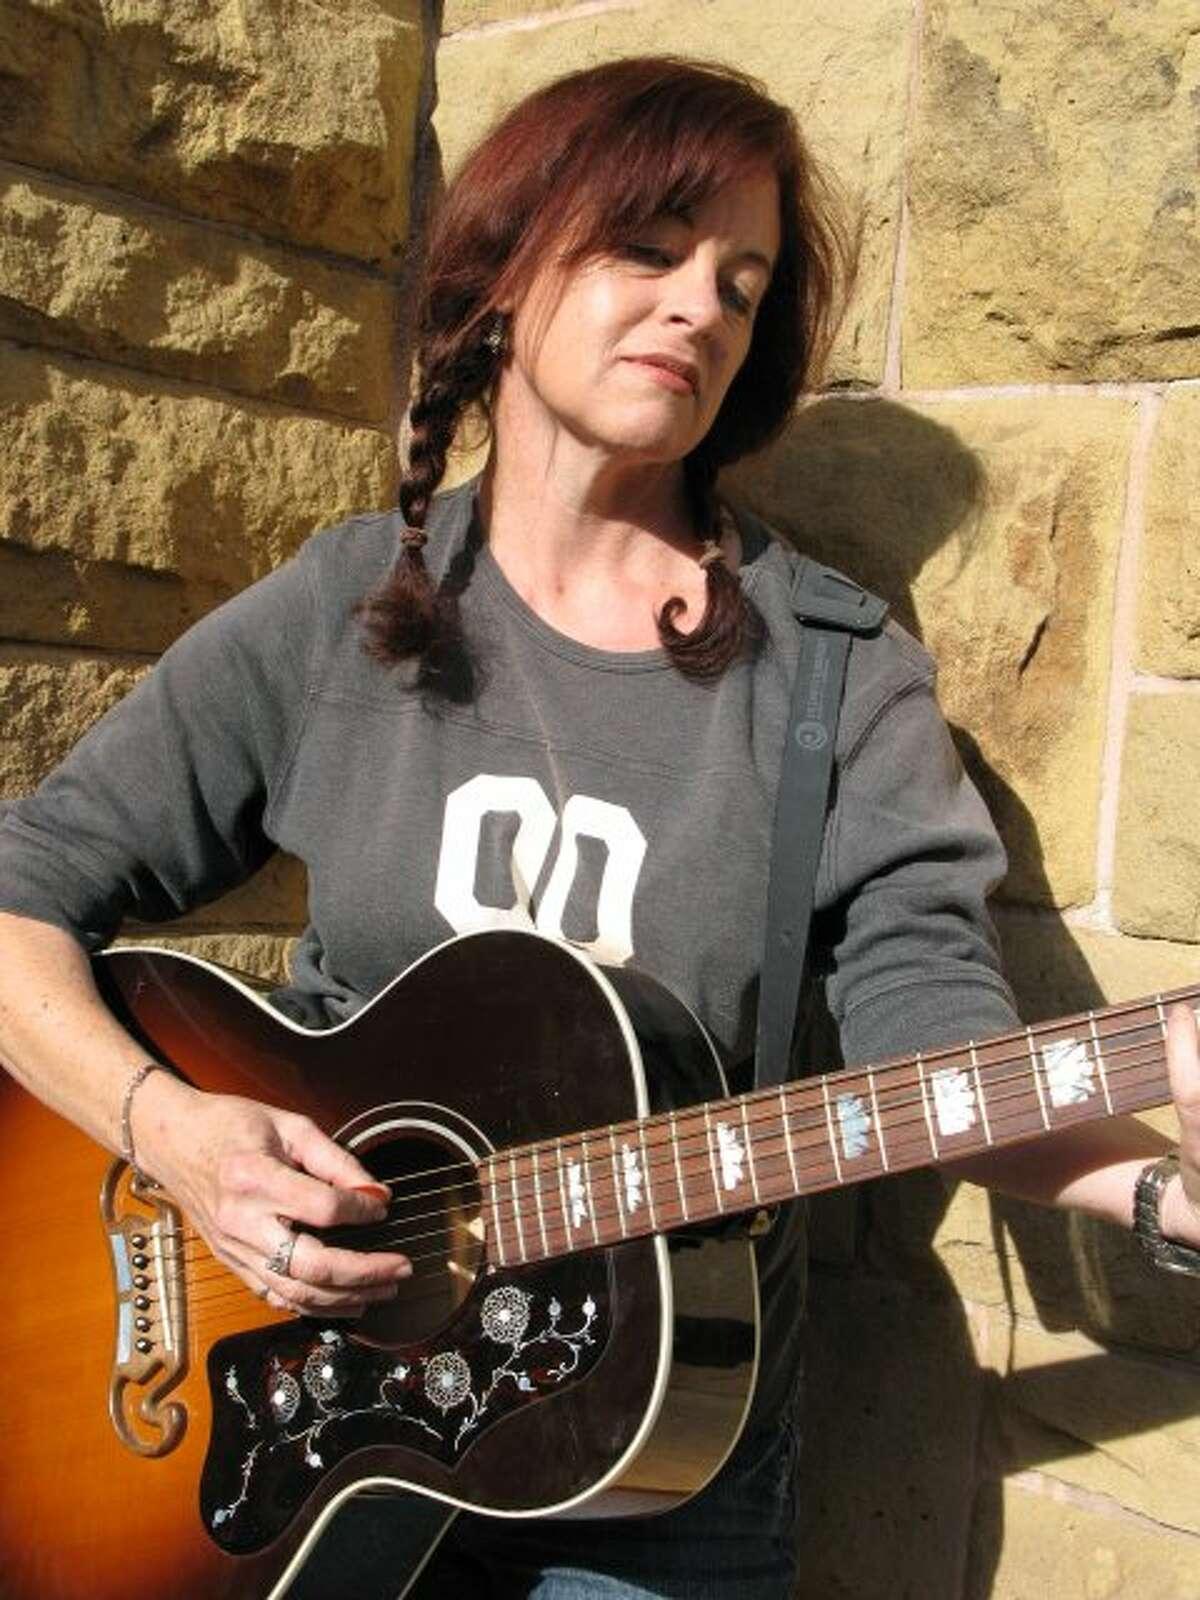 And Kim Wonderley, KCBS traffic anchor -- and musician --by Suzie Racho.